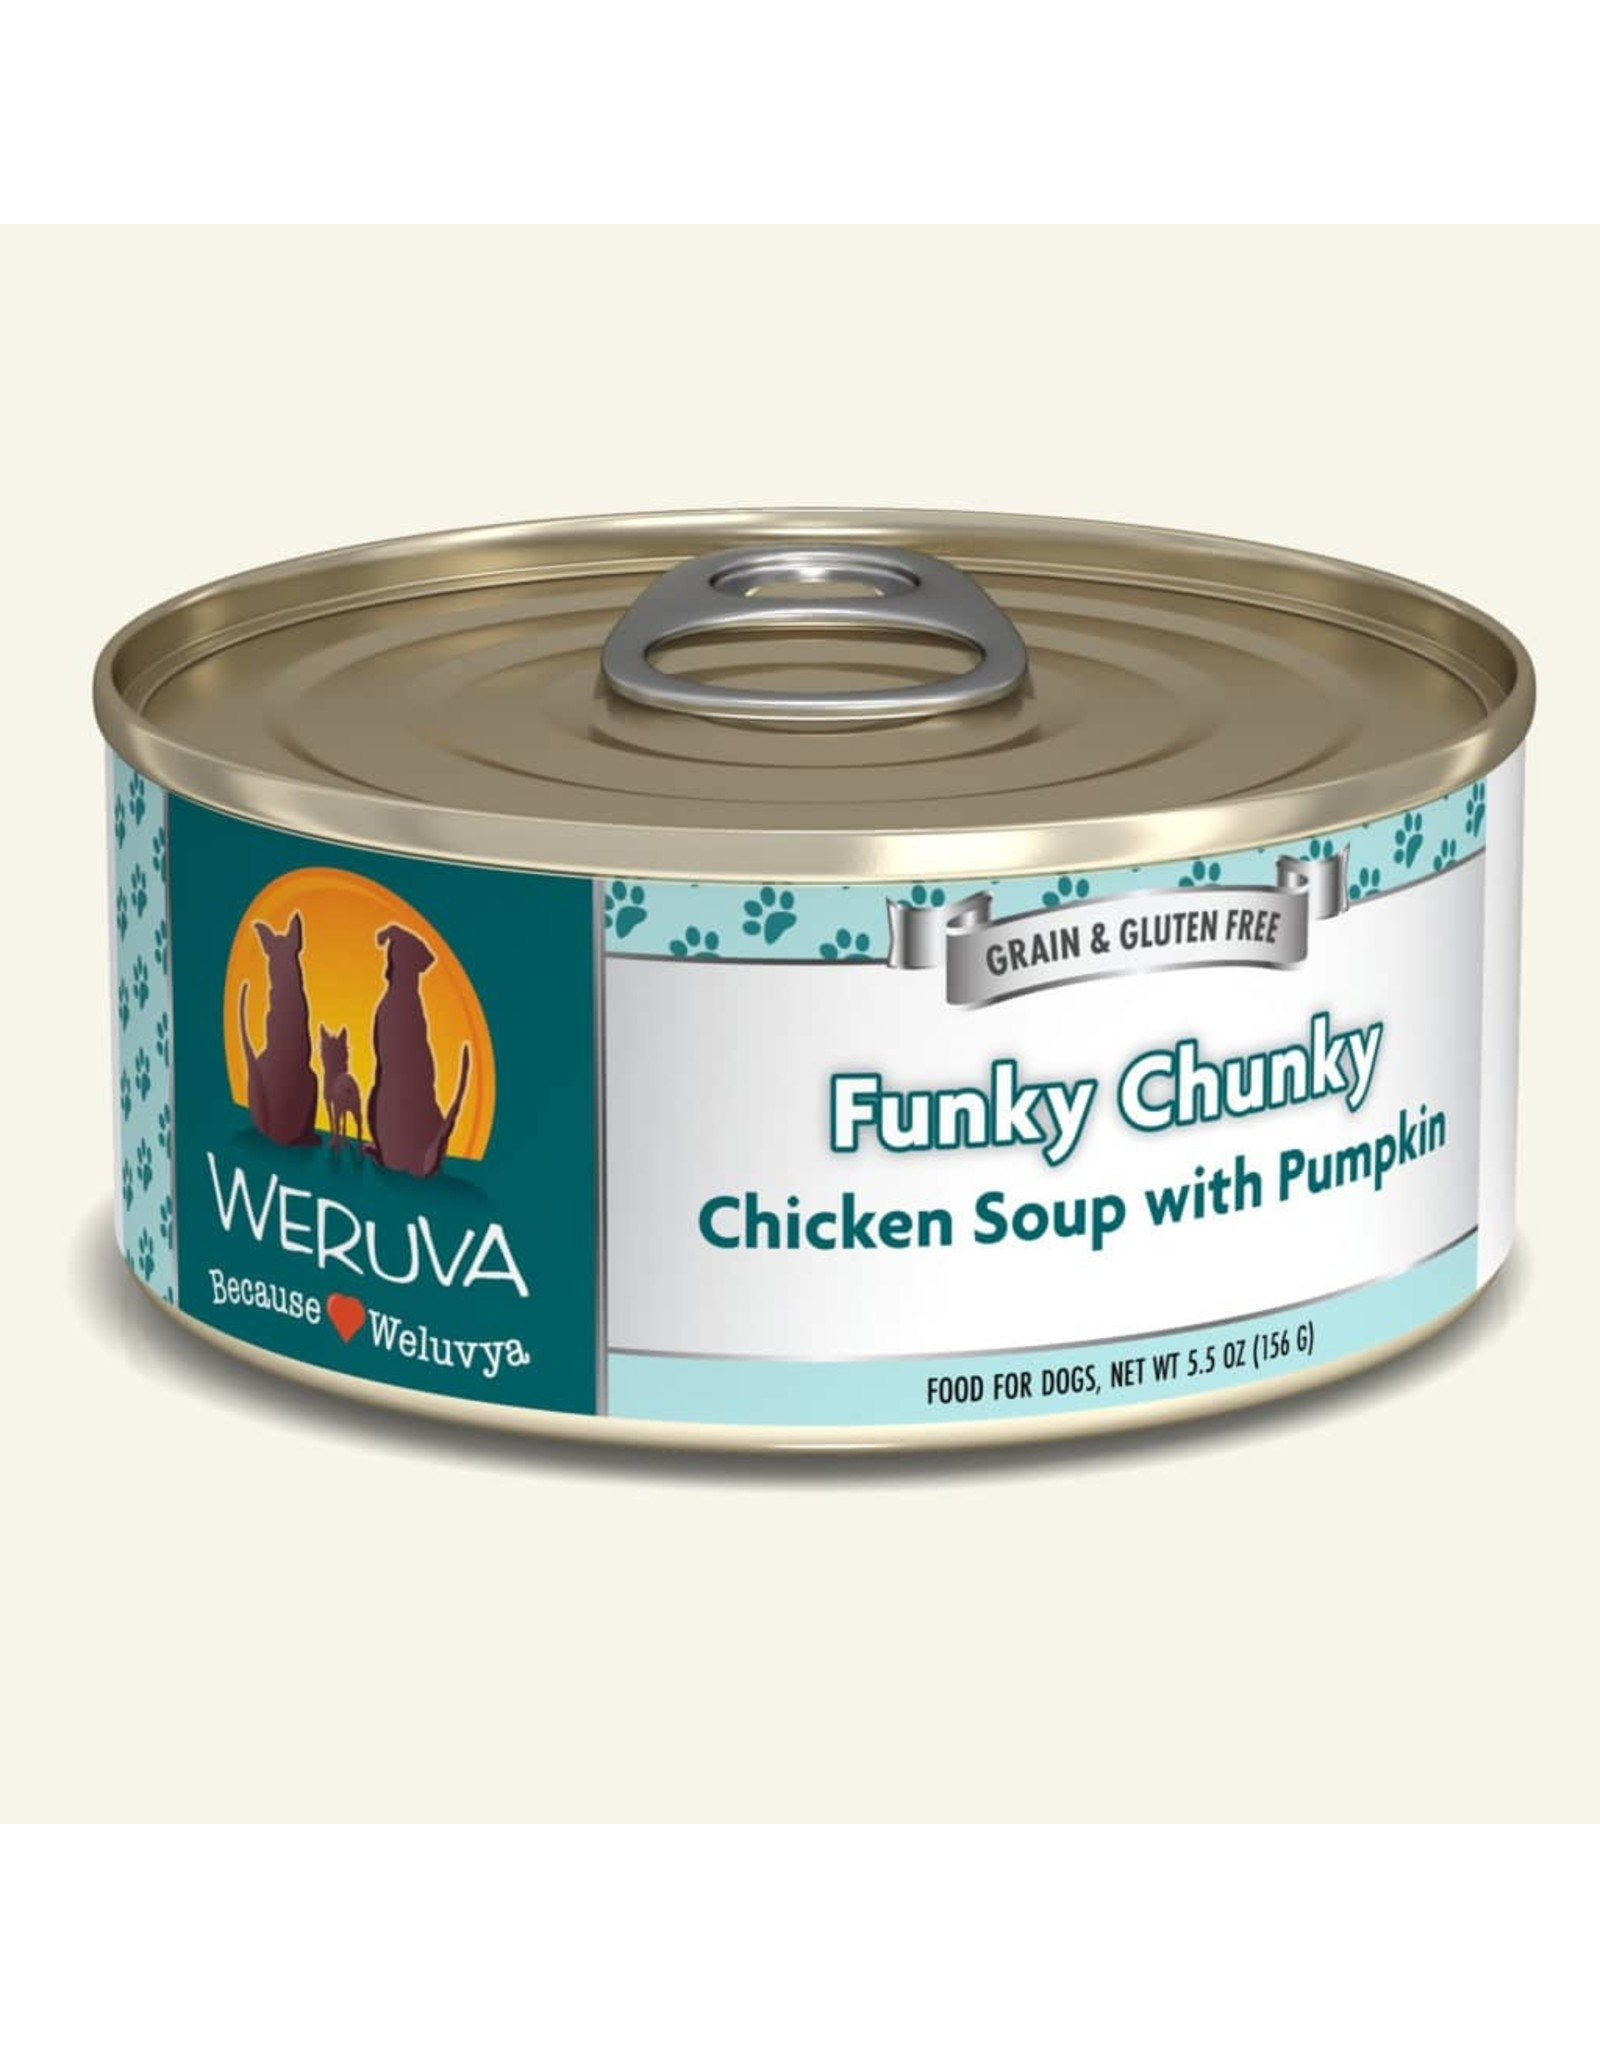 Weruva Weruva Funky Chunky Chicken Soup with Pumpkin Dog Food 5.5oz